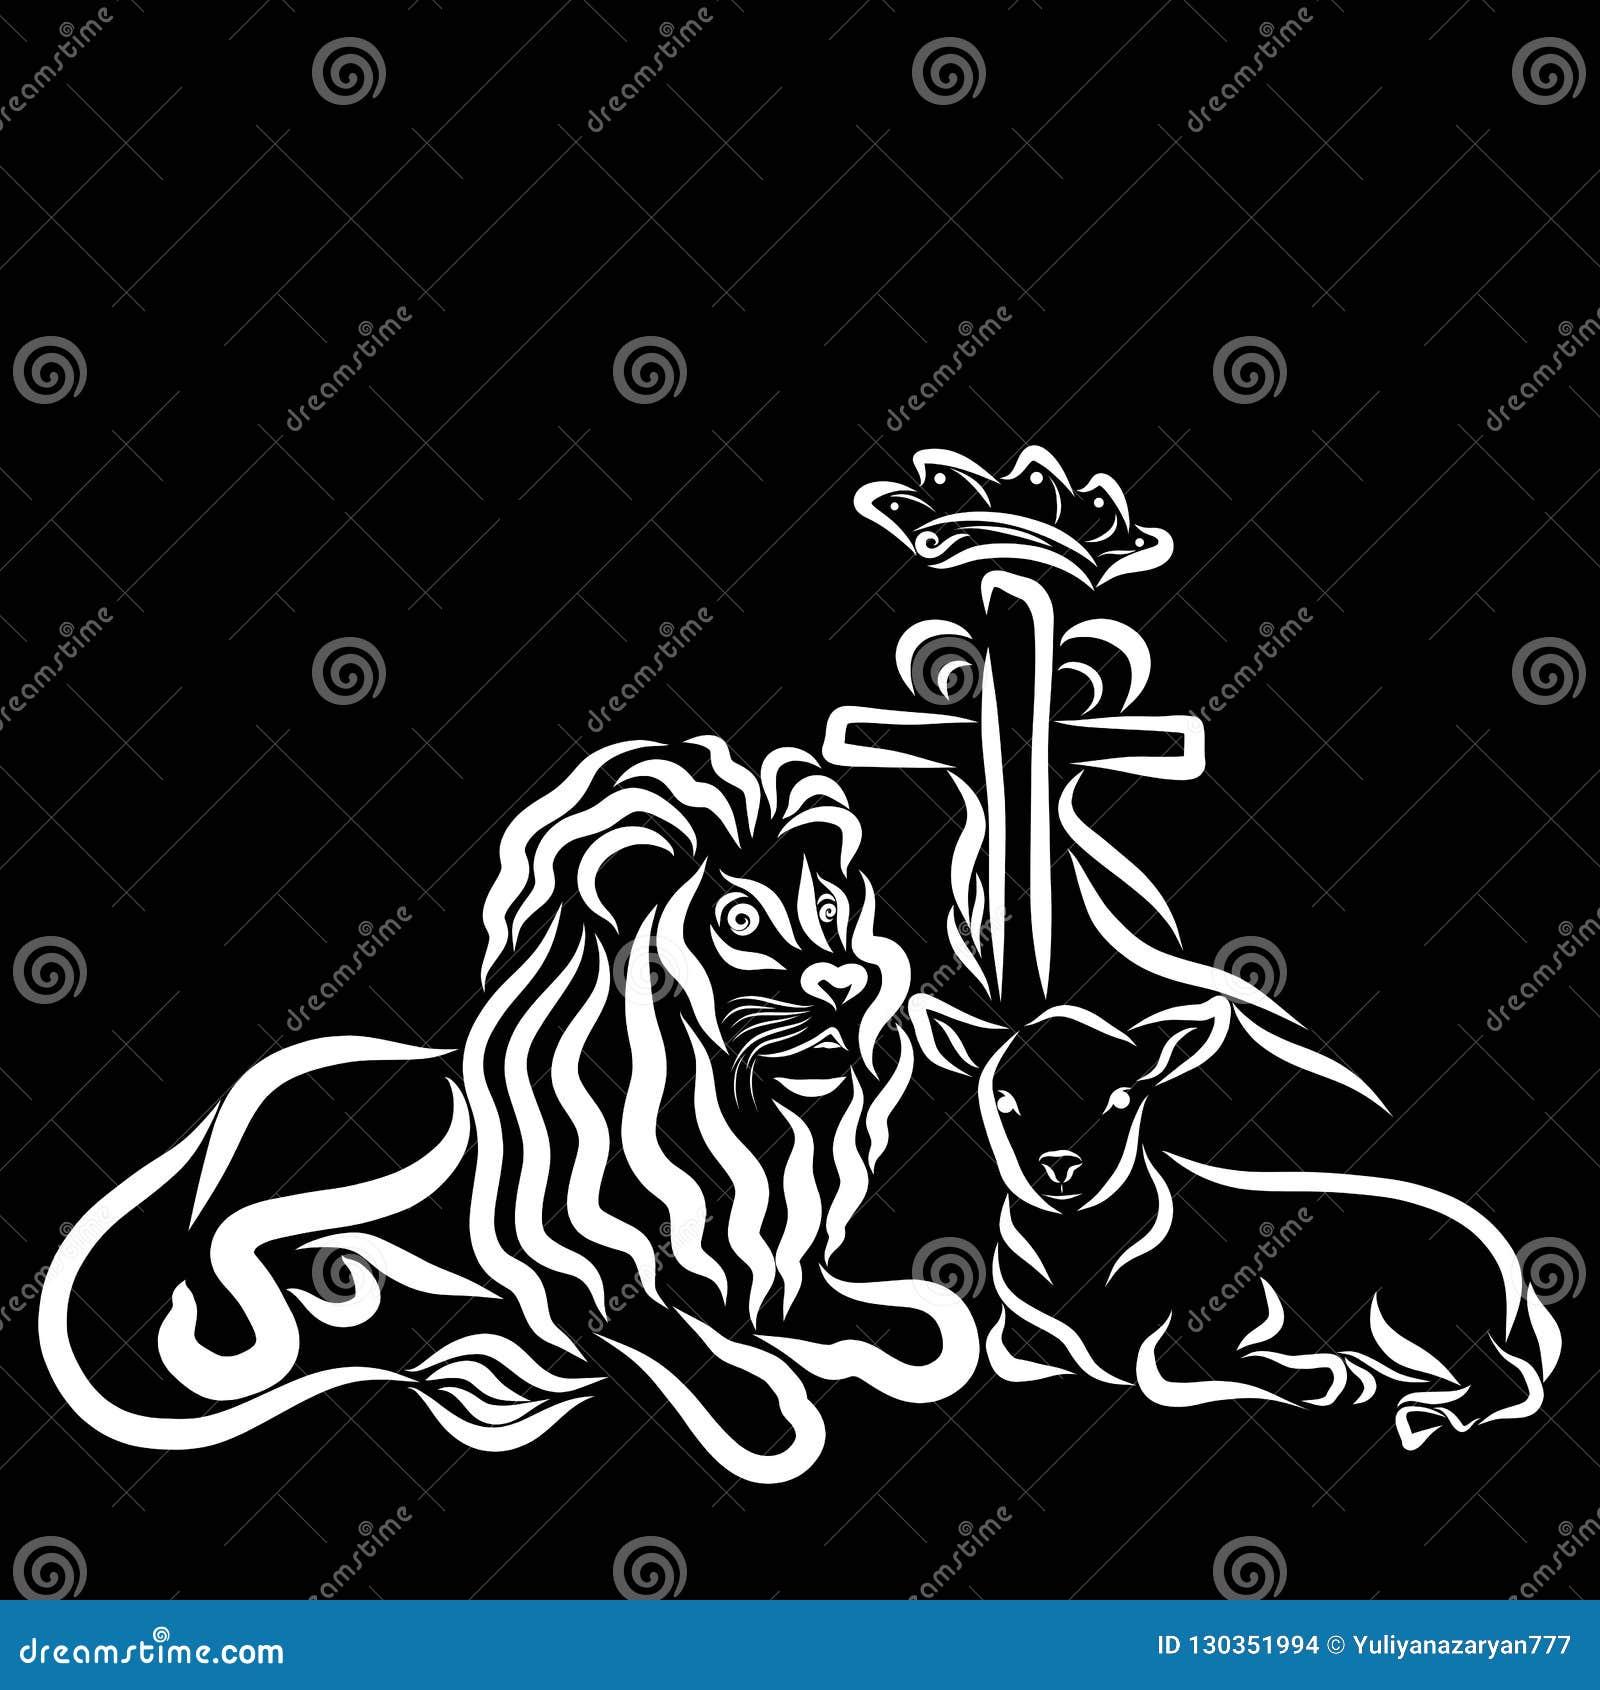 Cruz Com Coroa E Coracao Leao E Cordeiro Fundo Preto Ilustracao